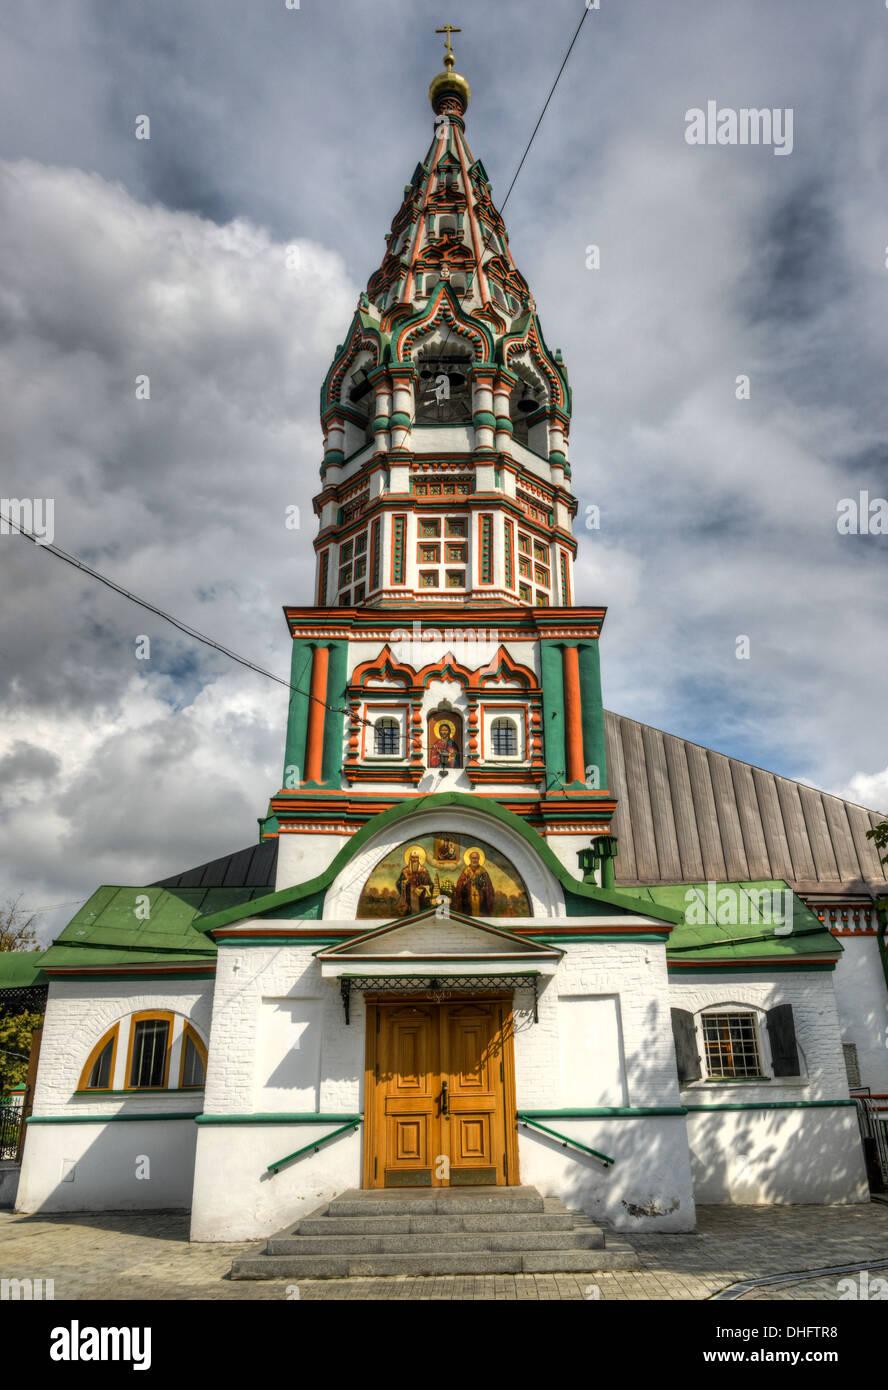 The Church of St. Nicholas the Wonderworker in Khamovniki - the shrine of Moscow